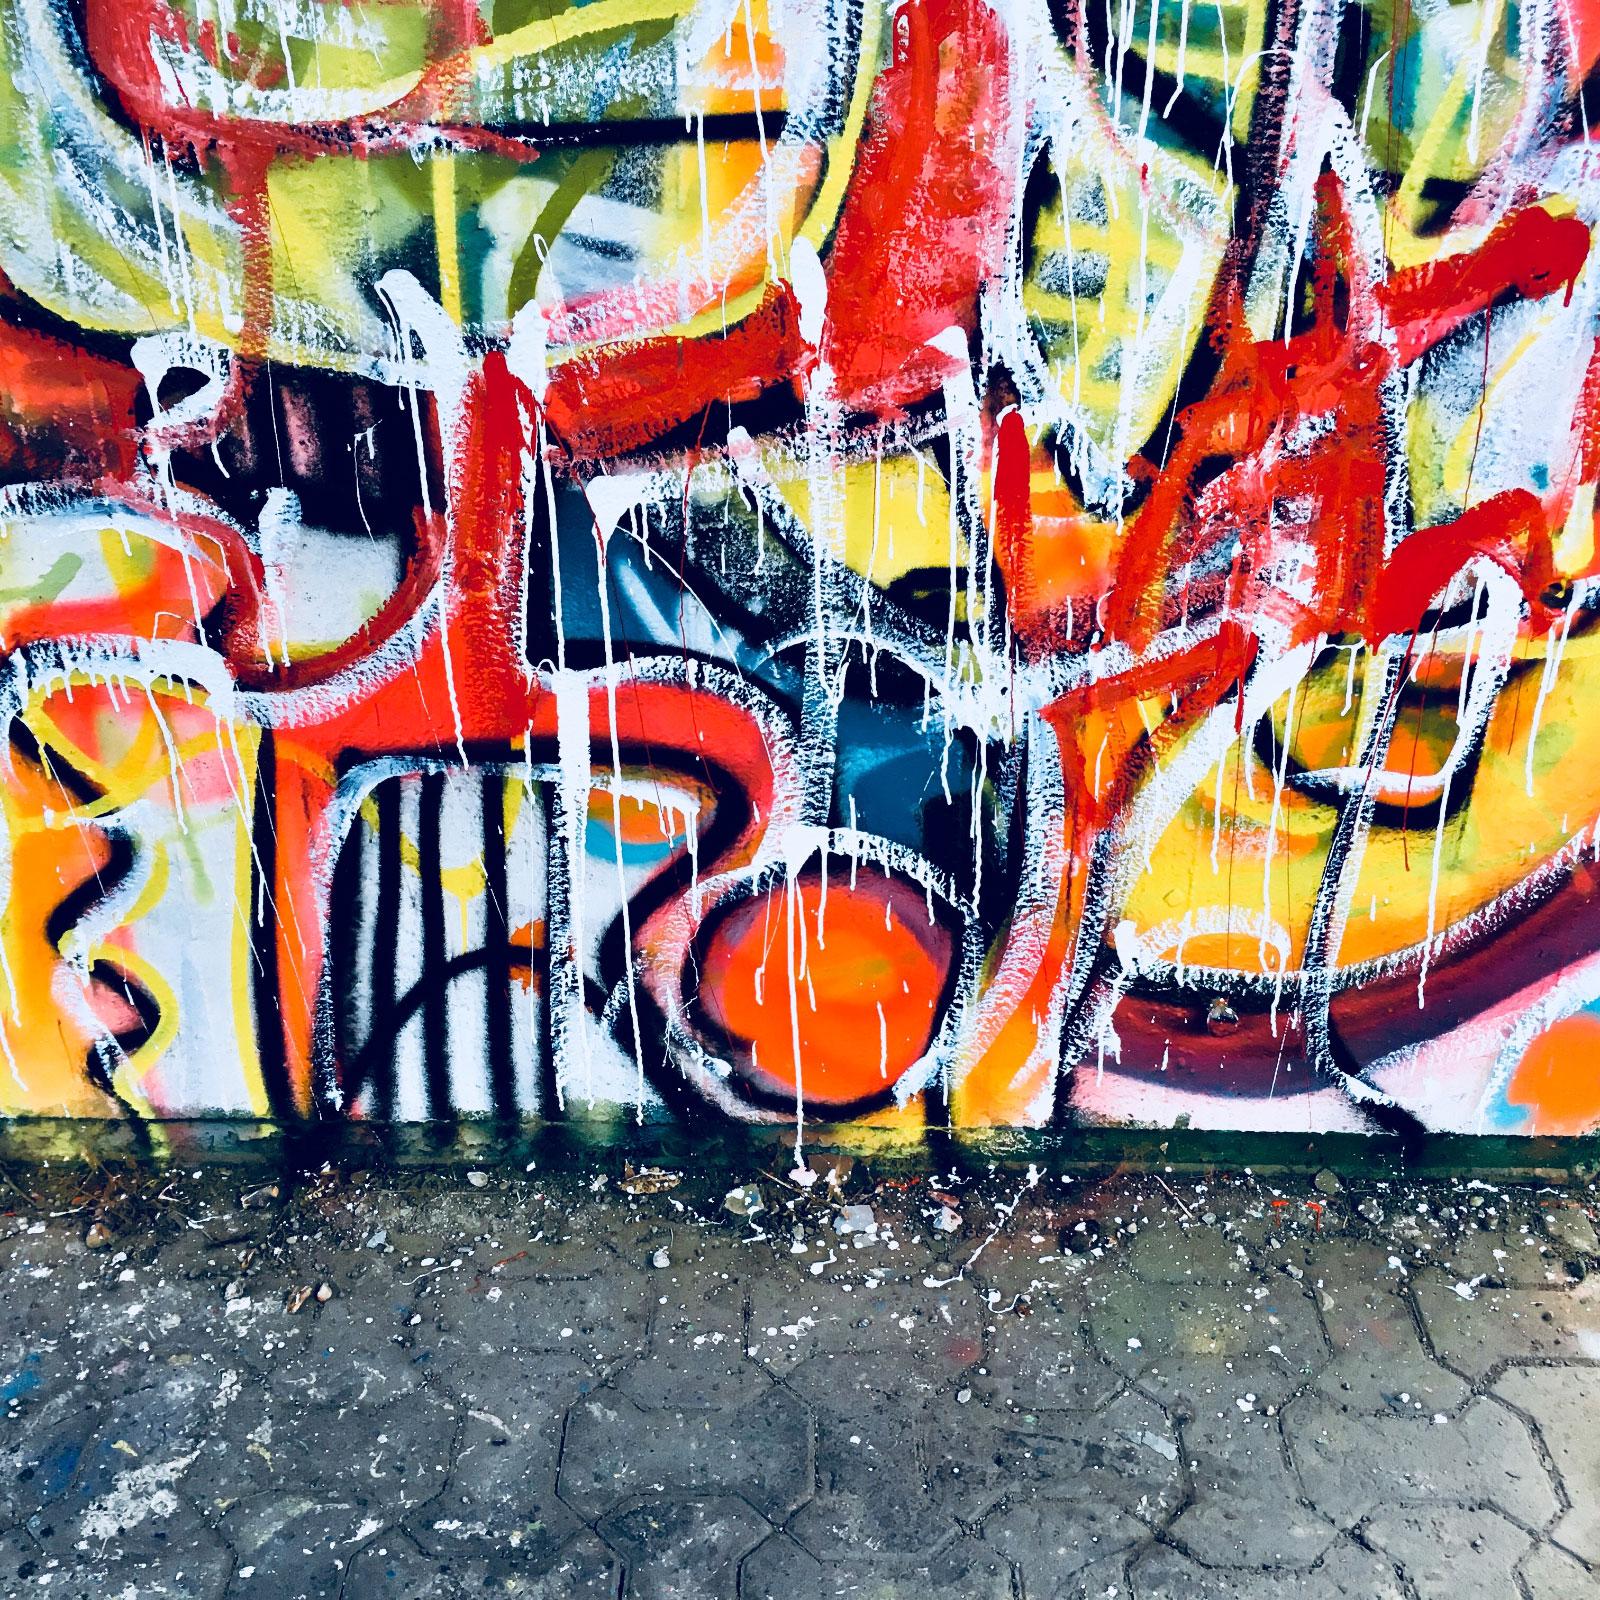 Rob_Adalierd_Painting_Vienna_Abstract_Contemporary_Street_art_3.jpg